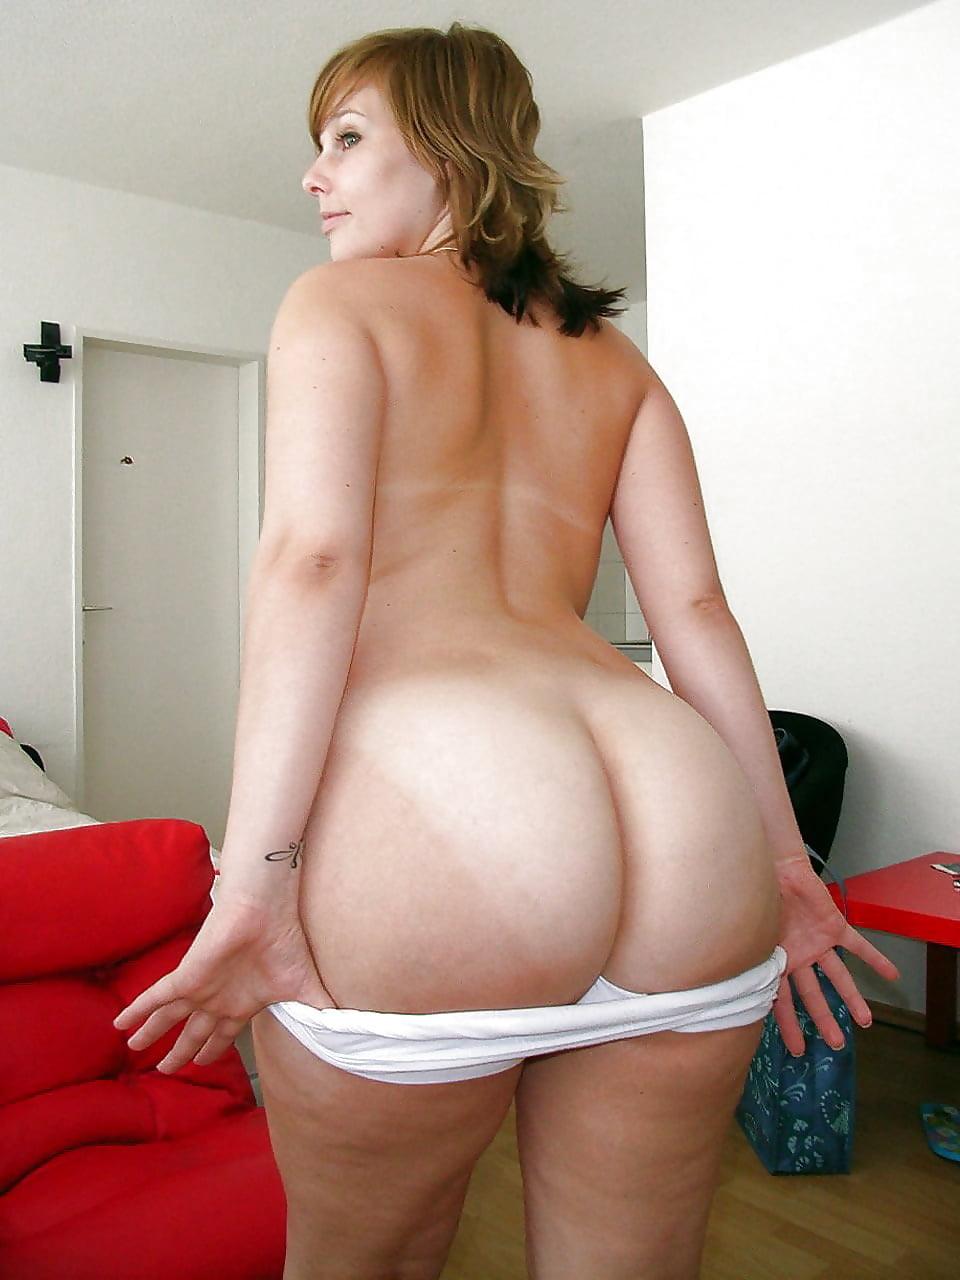 big-nude-butt-french-women